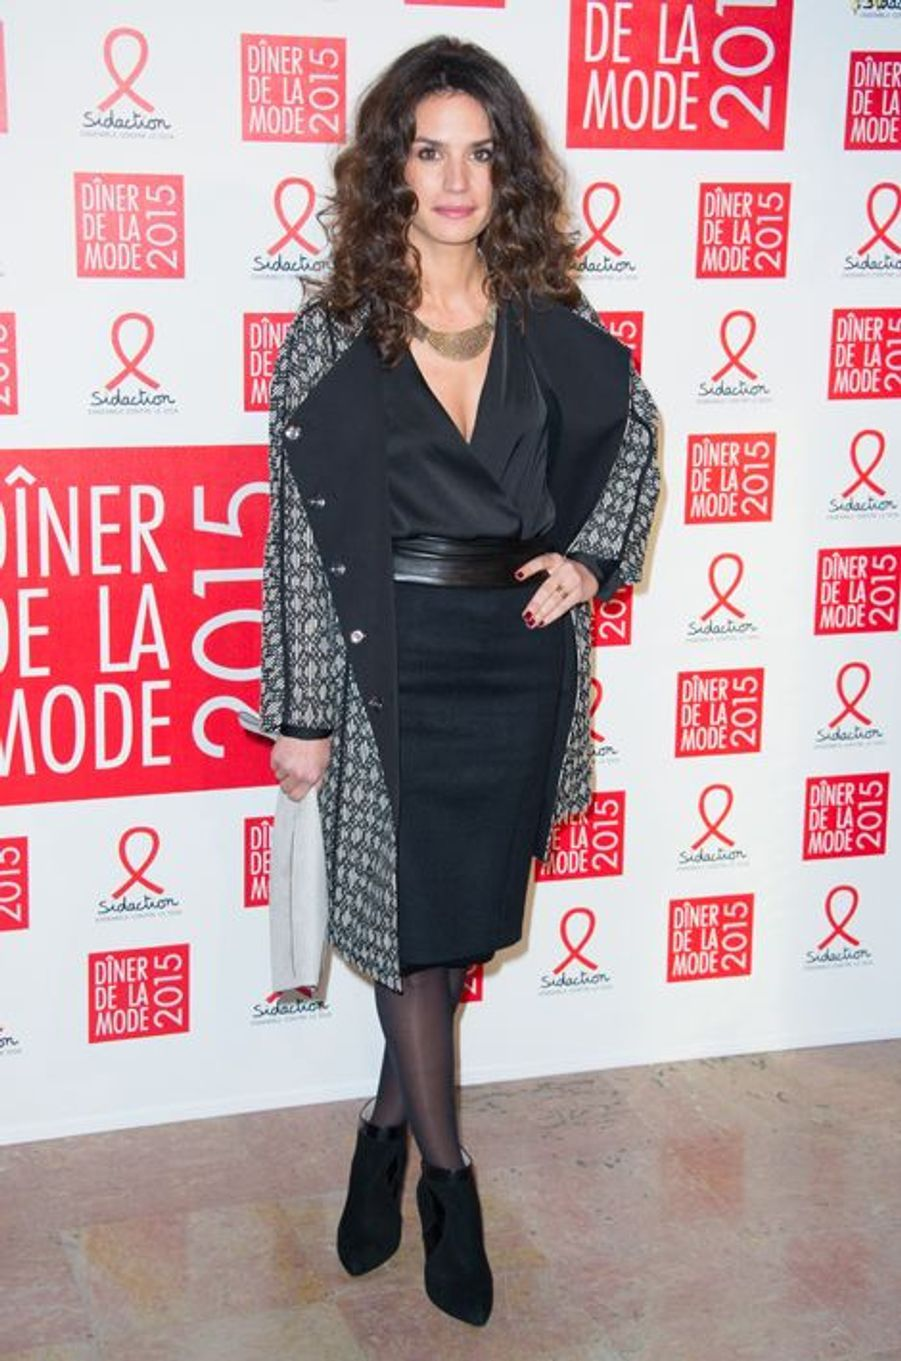 Barbara Cabrita à Paris le 29 janvier 2015